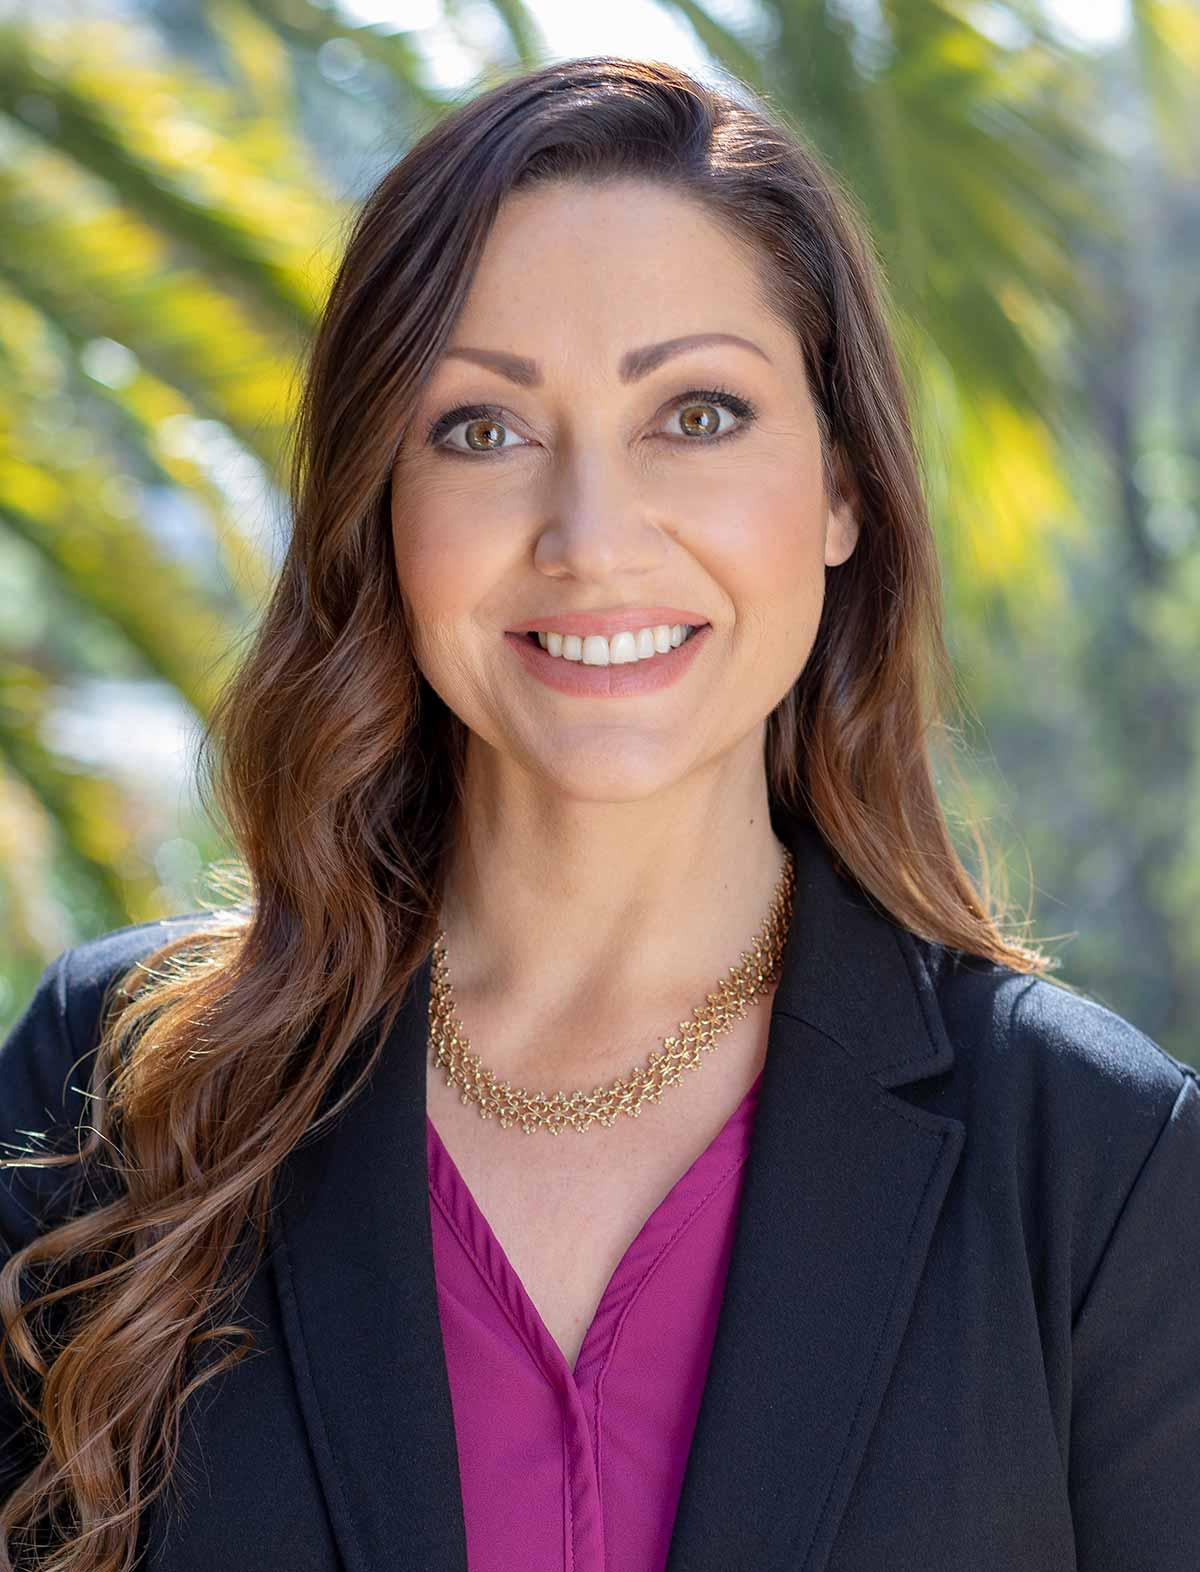 Susan Polk Insurance San Luis Obispo headshot Sonja